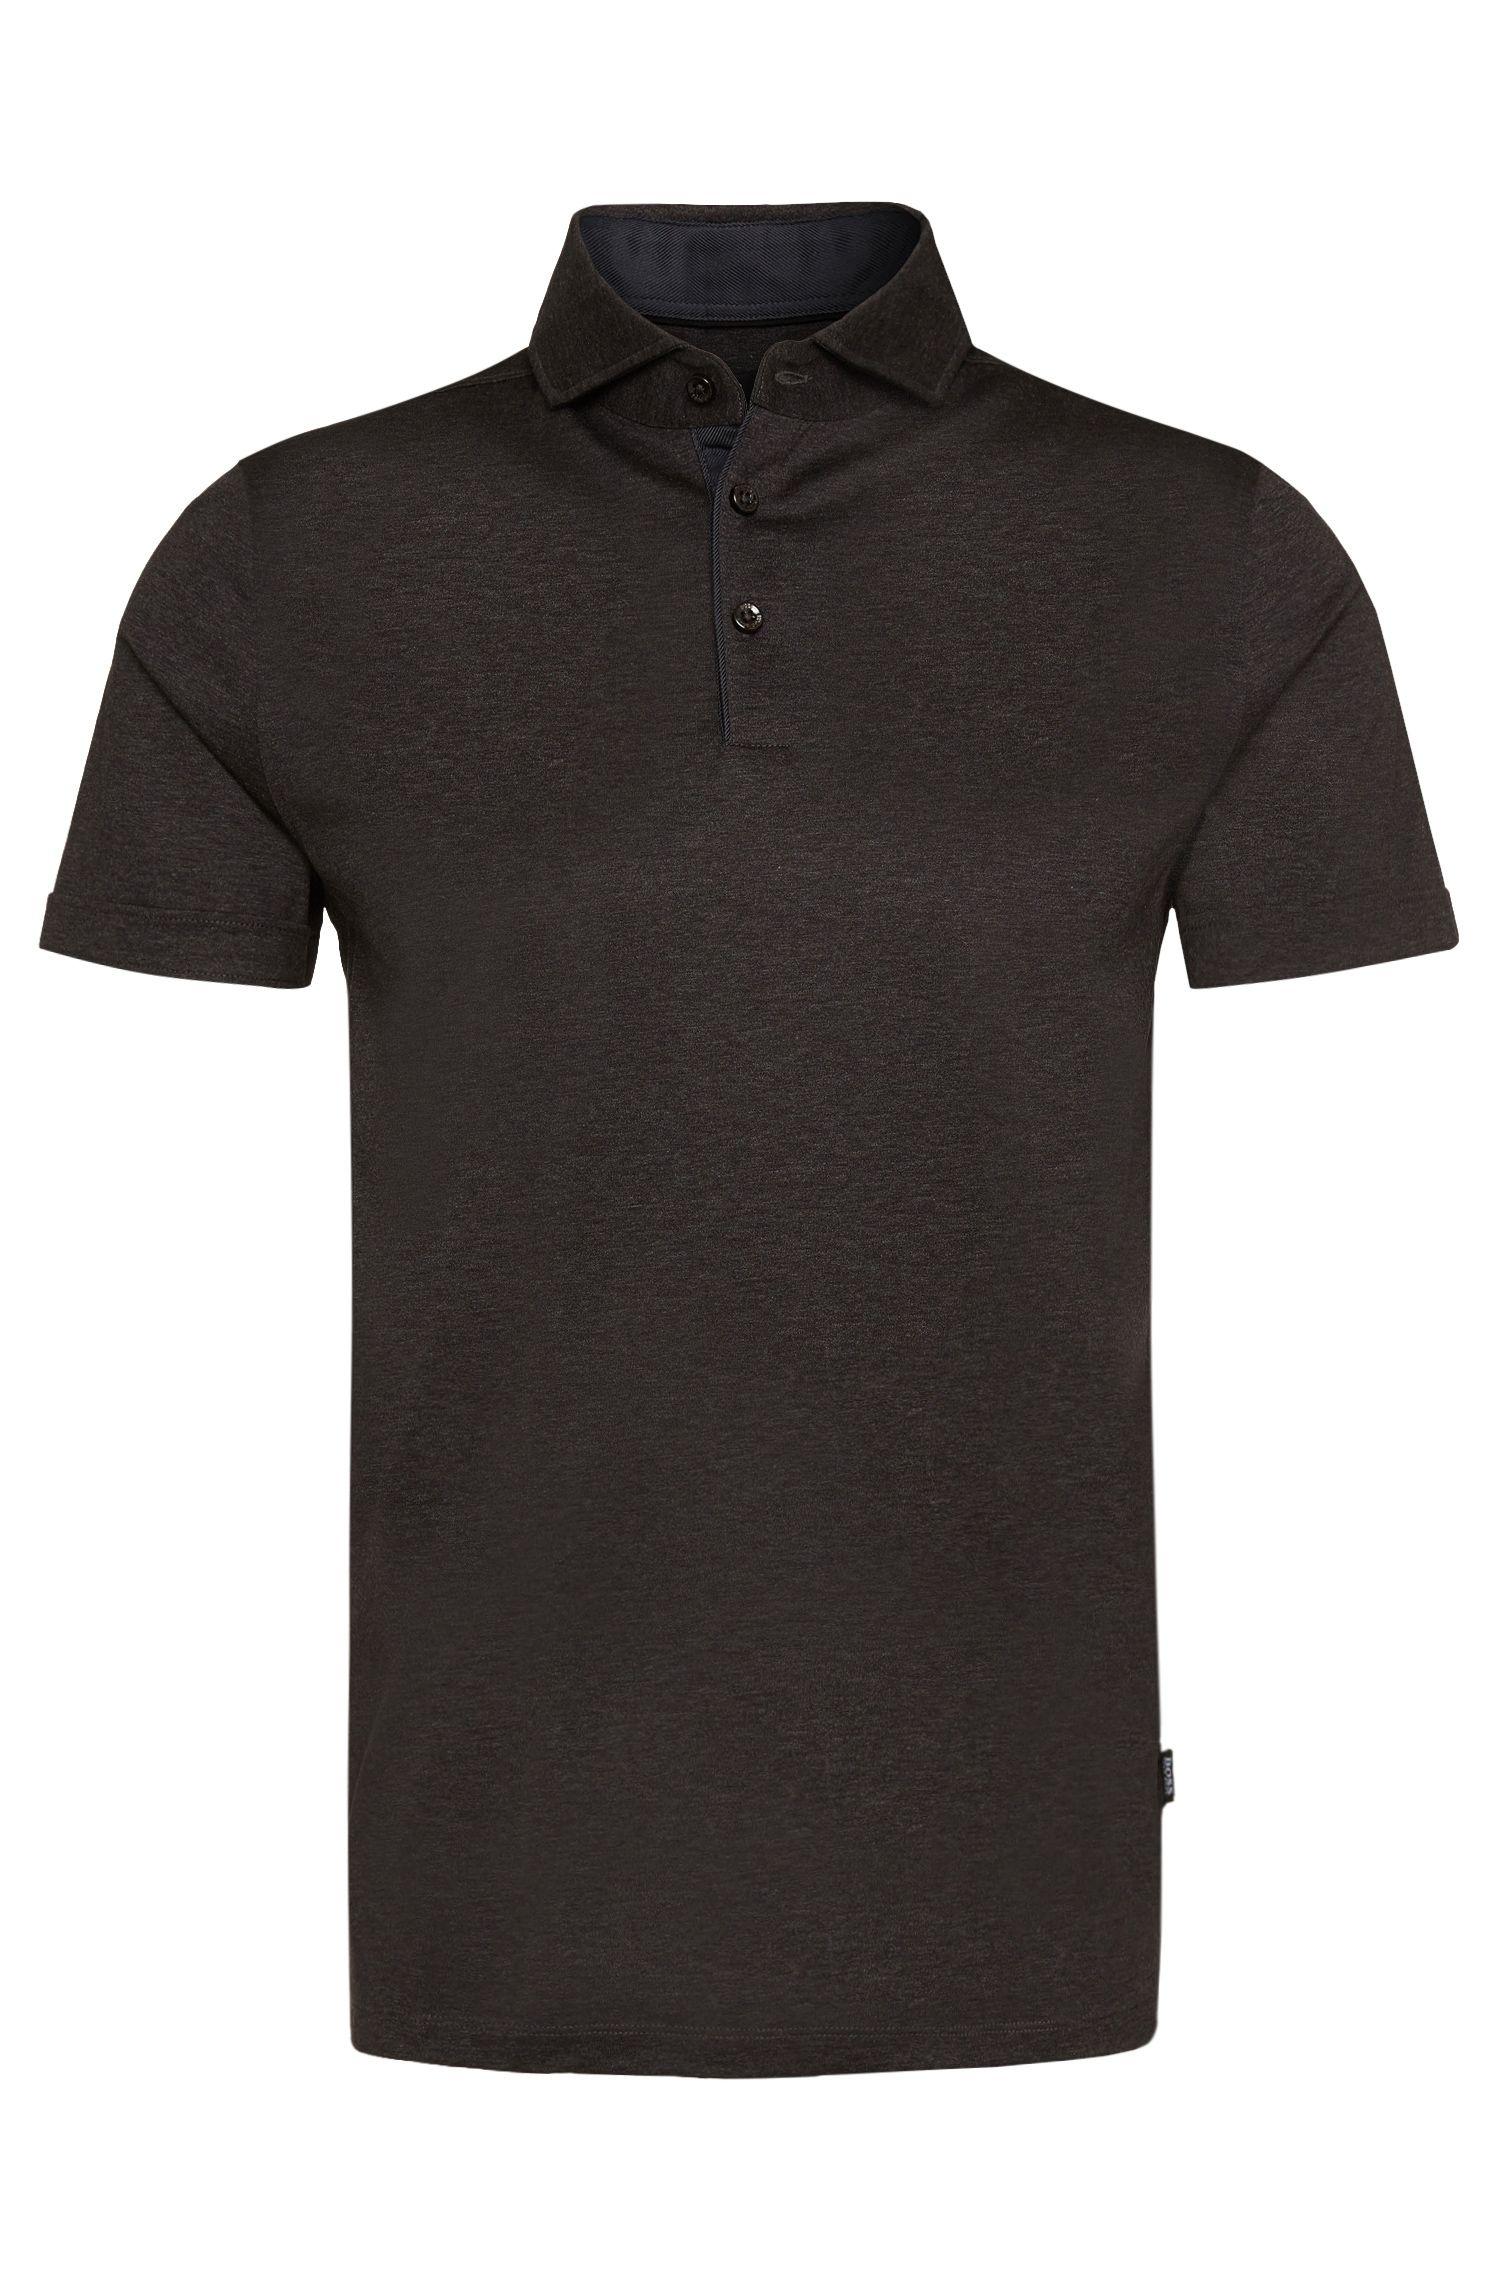 Slim-Fit Poloshirt aus Baumwolle: 'Platt 01'